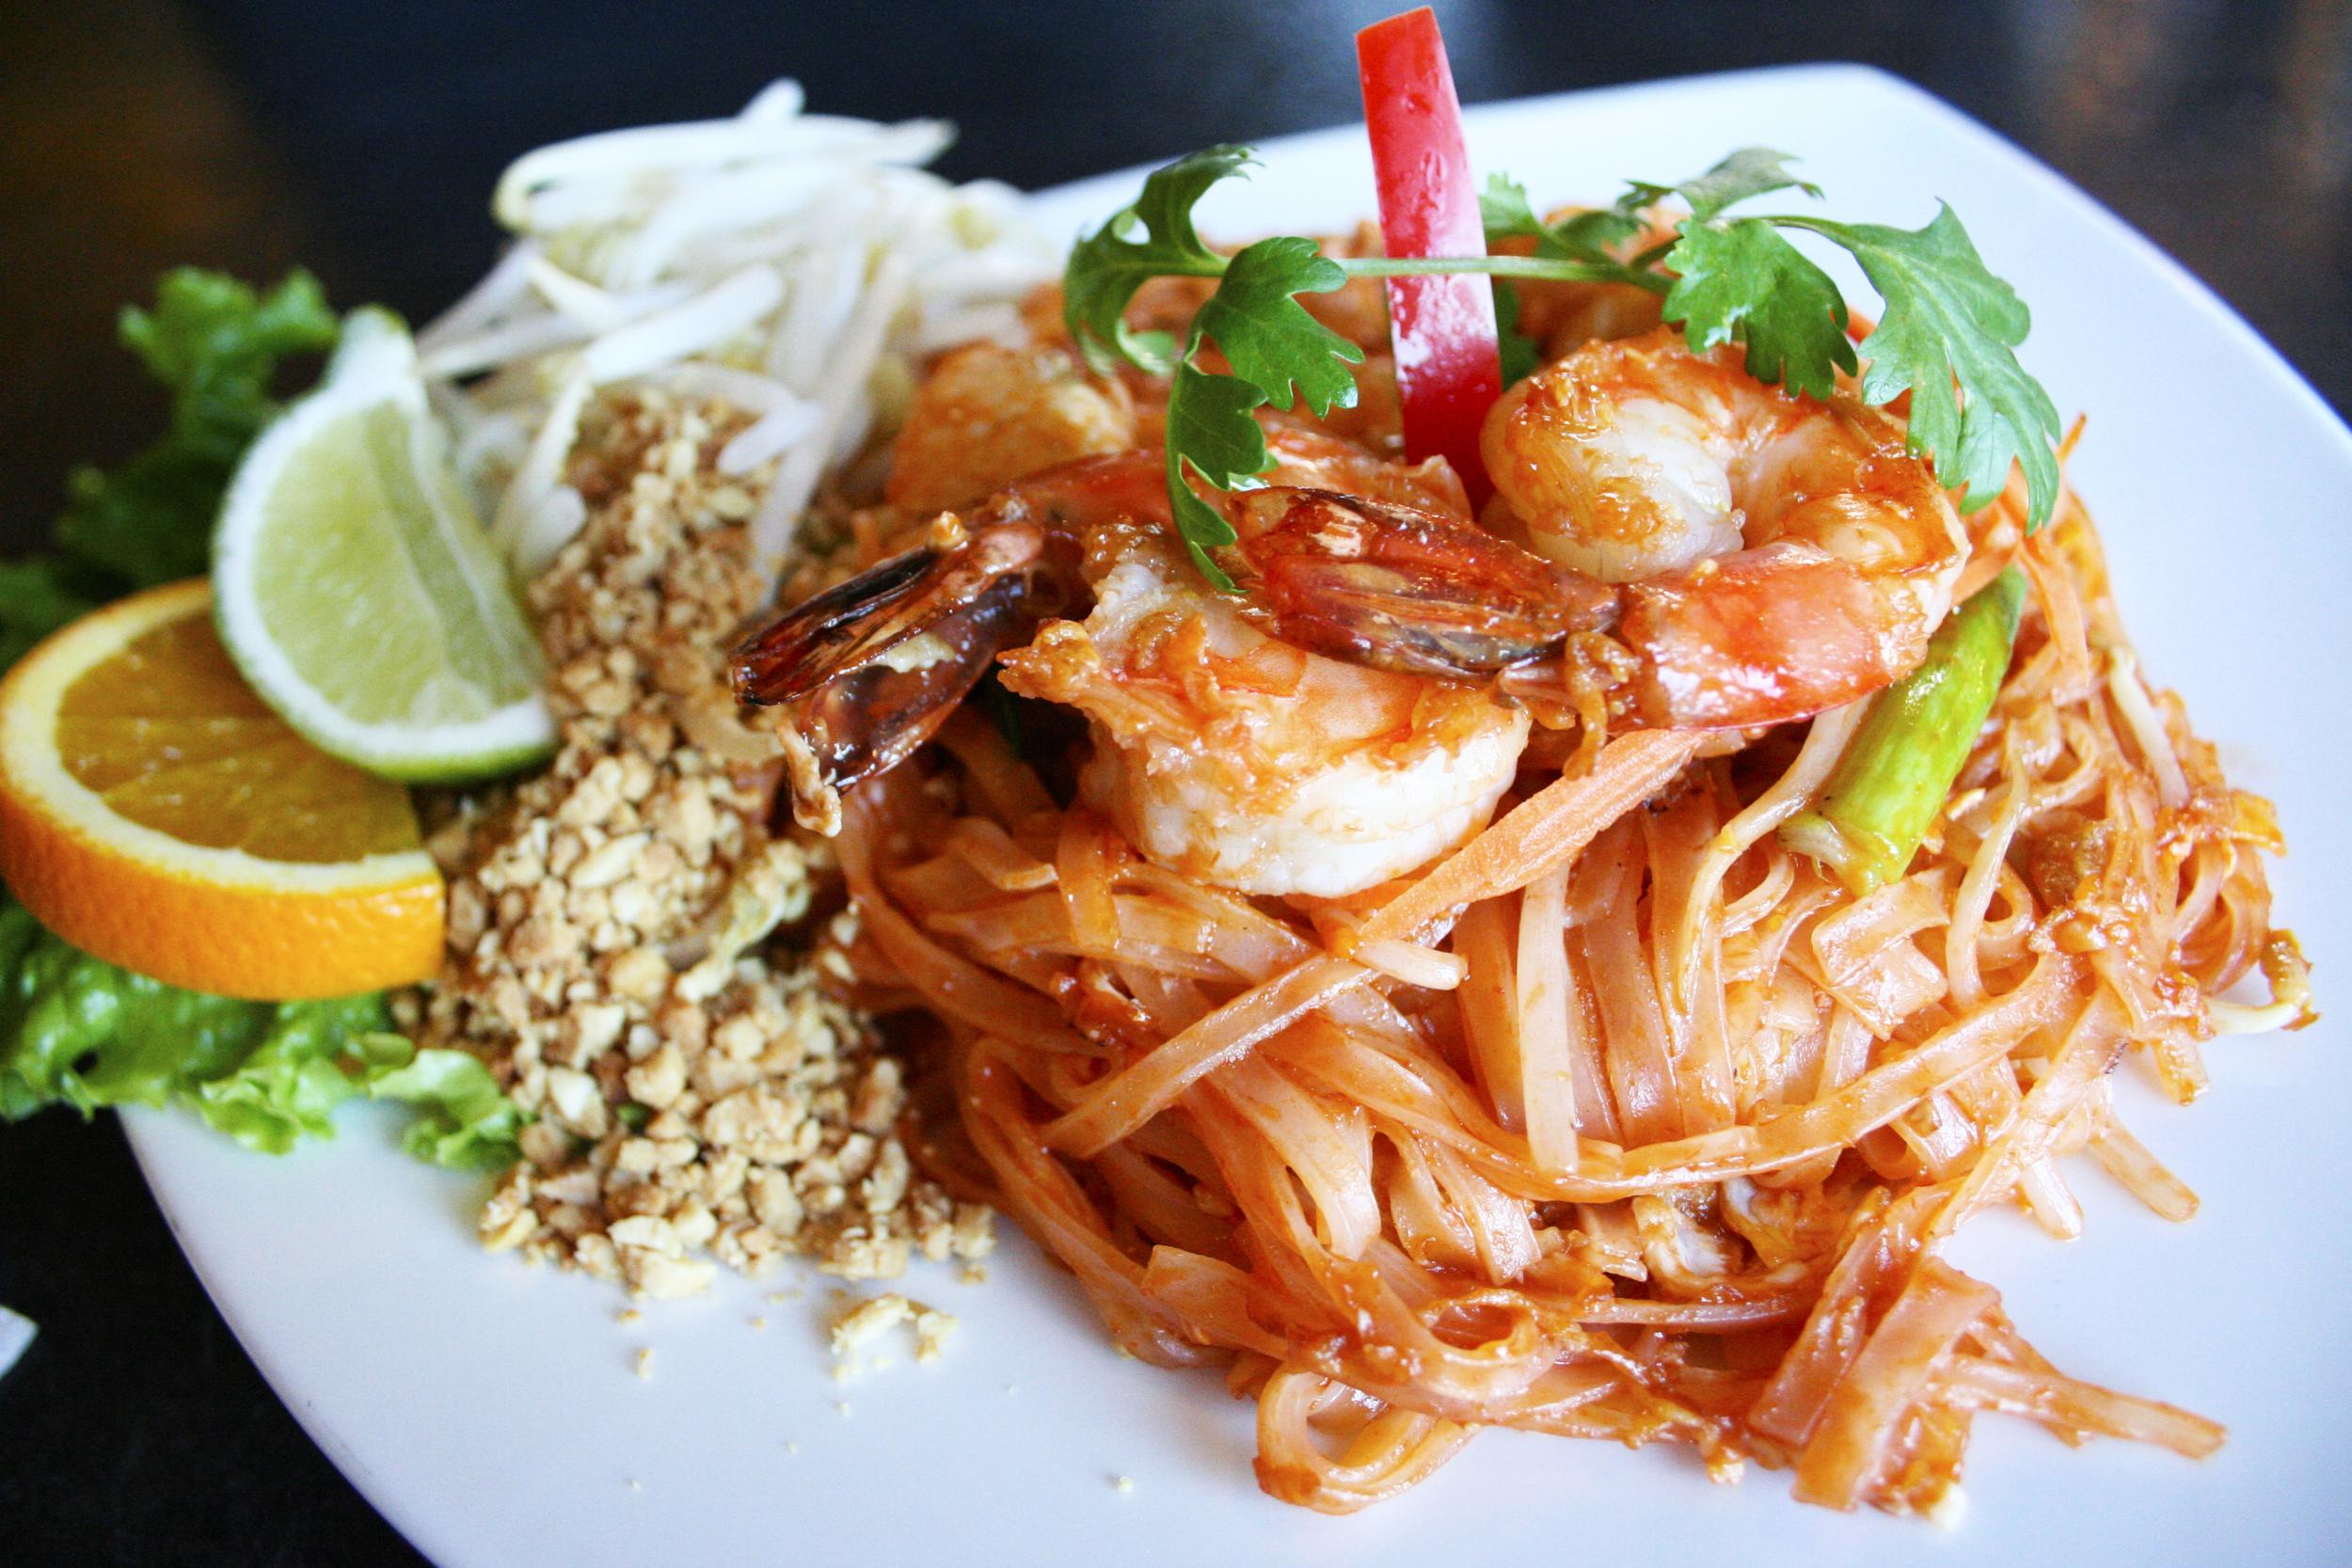 23-Pad-Thai-retouch.jpg